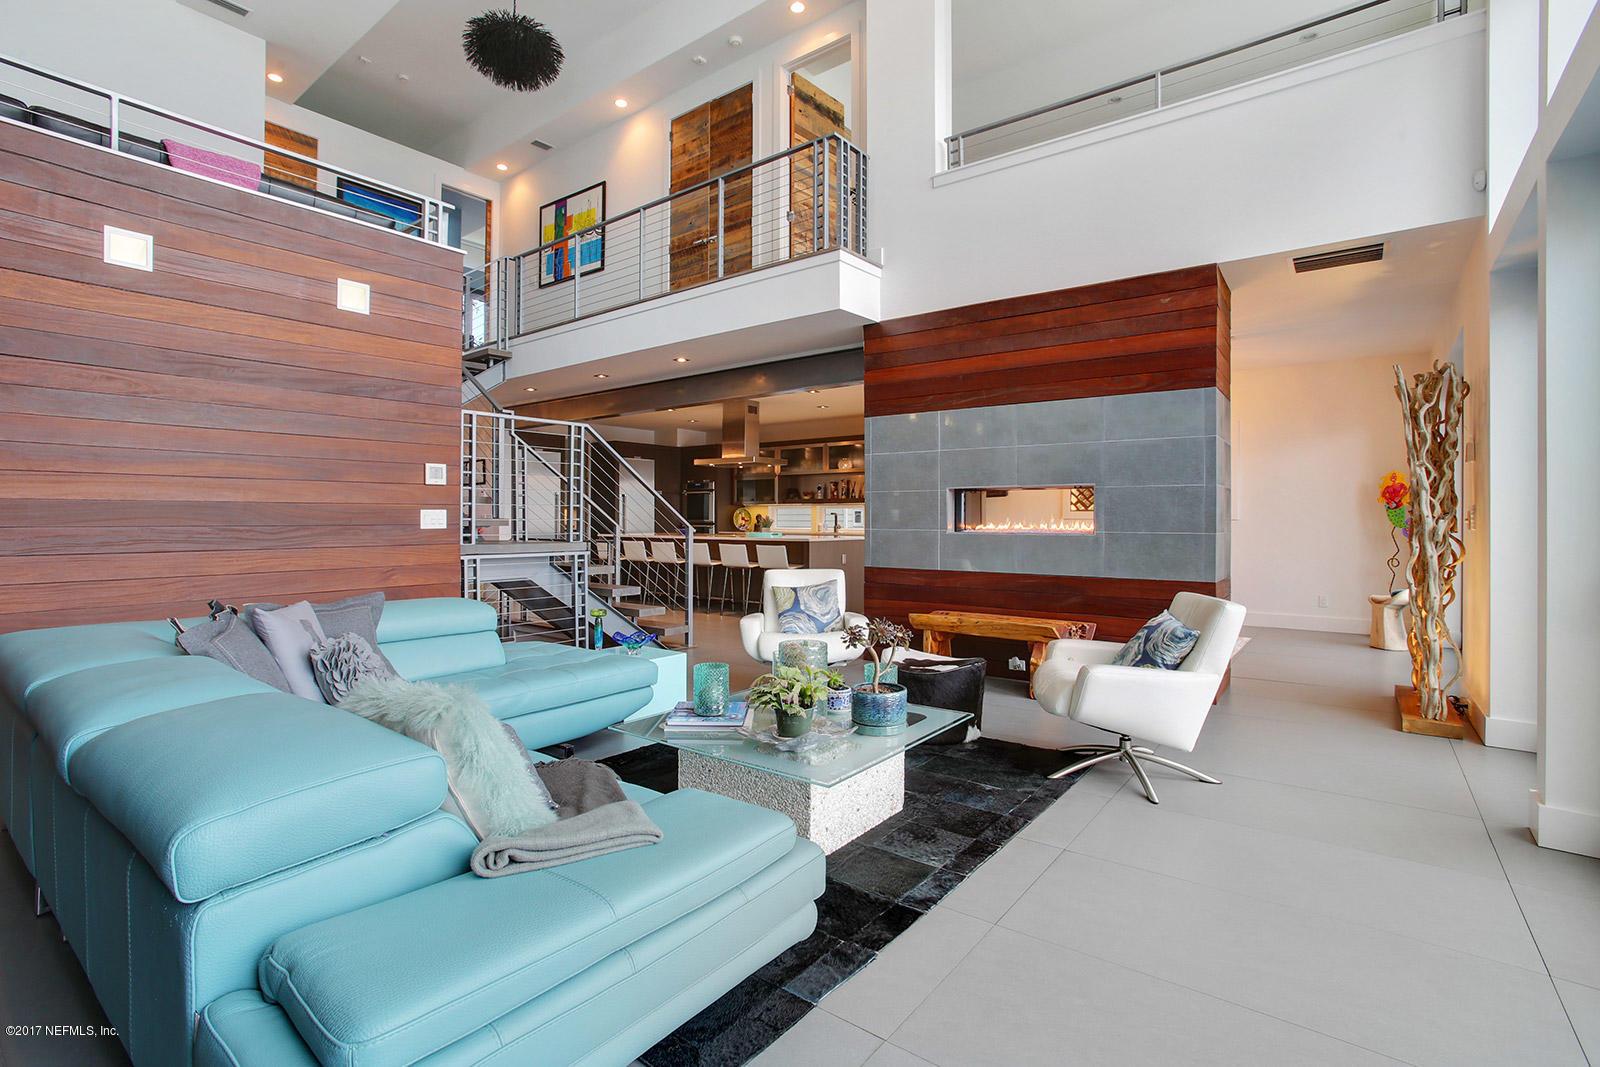 2061 BEACH, ATLANTIC BEACH, FLORIDA 32233, 4 Bedrooms Bedrooms, ,4 BathroomsBathrooms,Residential - single family,For sale,BEACH,972726